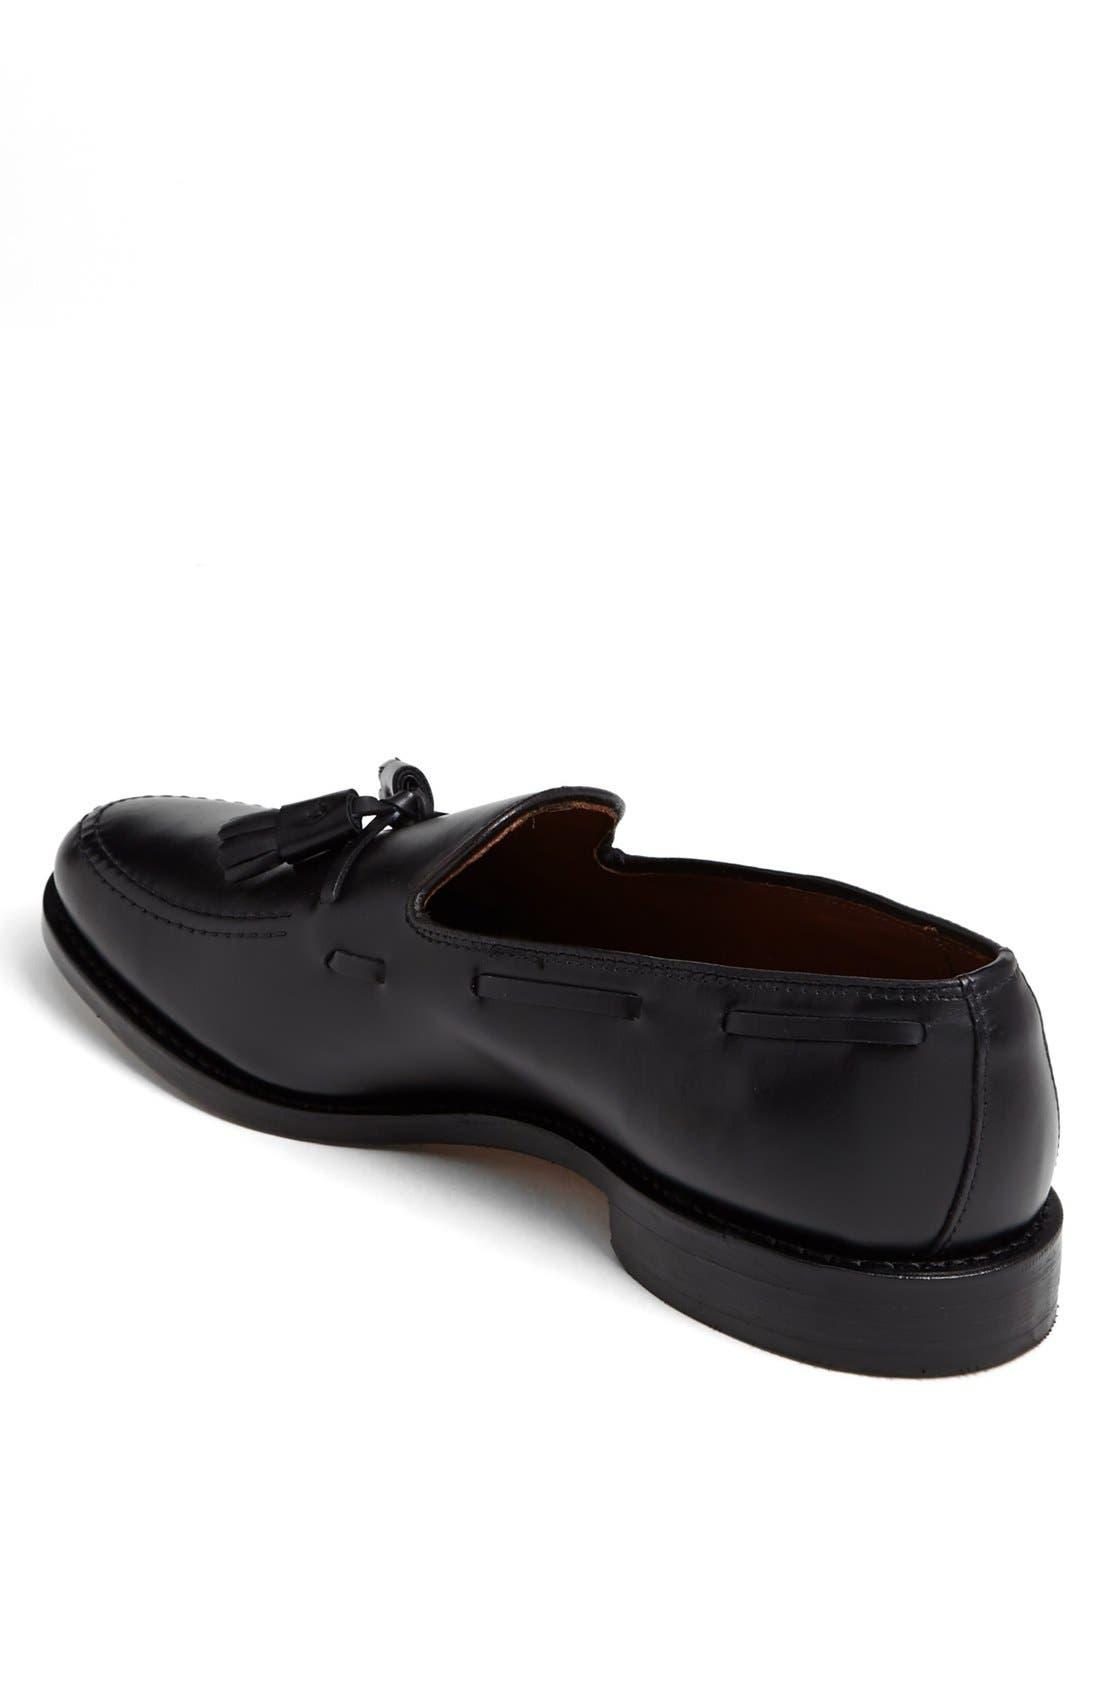 Alternate Image 2  - Allen Edmonds 'Grayson' Tassel Loafer (Men)